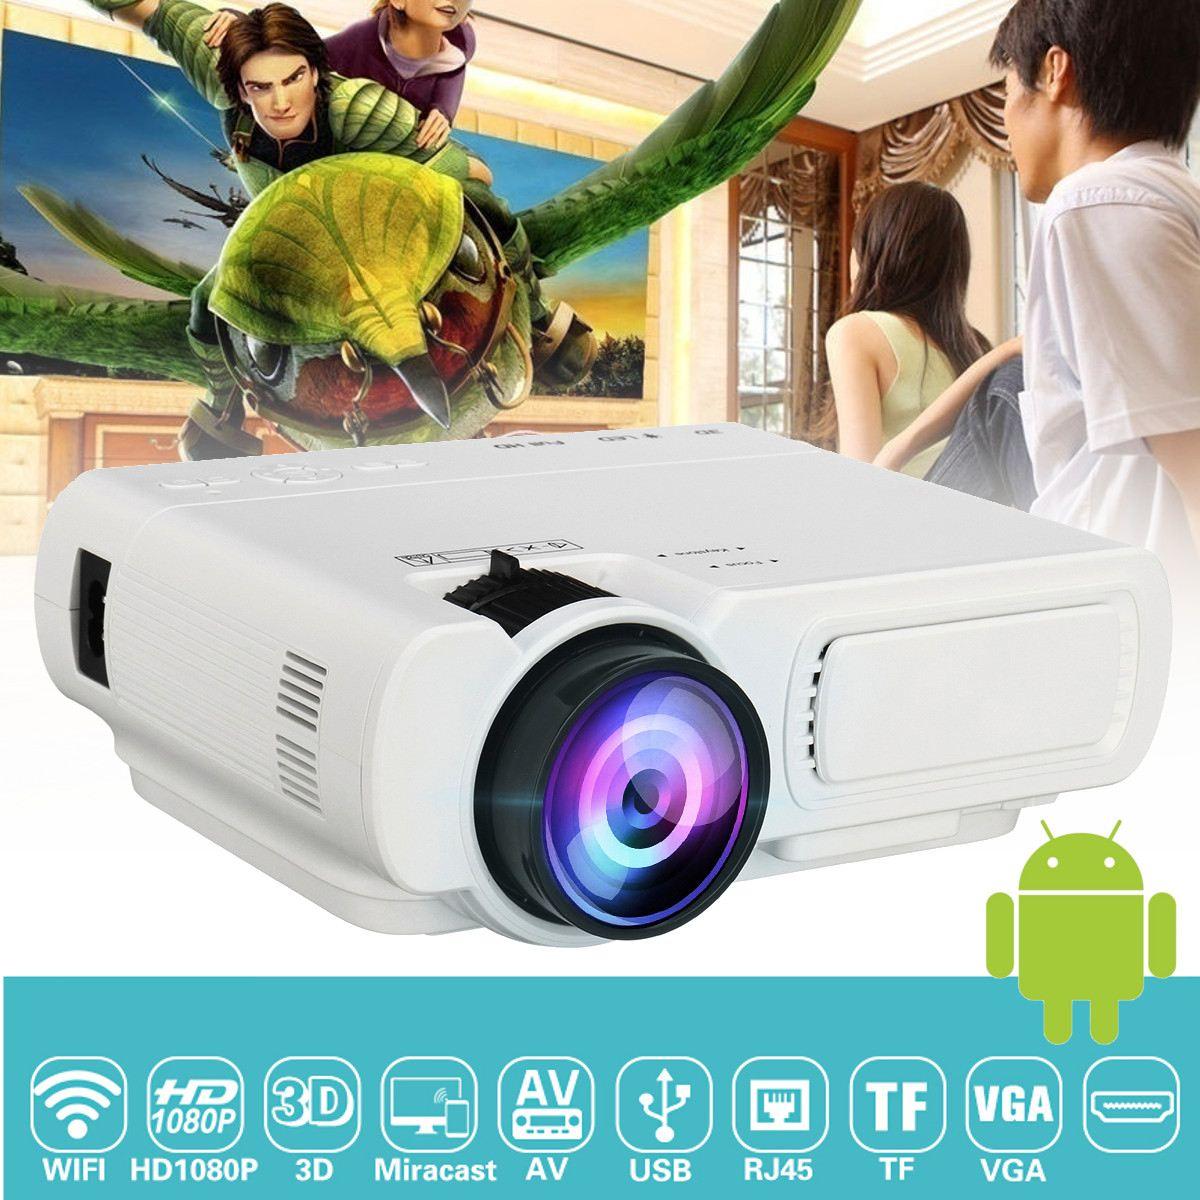 Unterhaltungselektronik DemüTigen Mini Projektor T5 Lcd 7000 Lumen 1080 P Full Hd Wifi Bluetooth Heimkino Android 6.0 Audio Lautsprecher Heimkino Kino